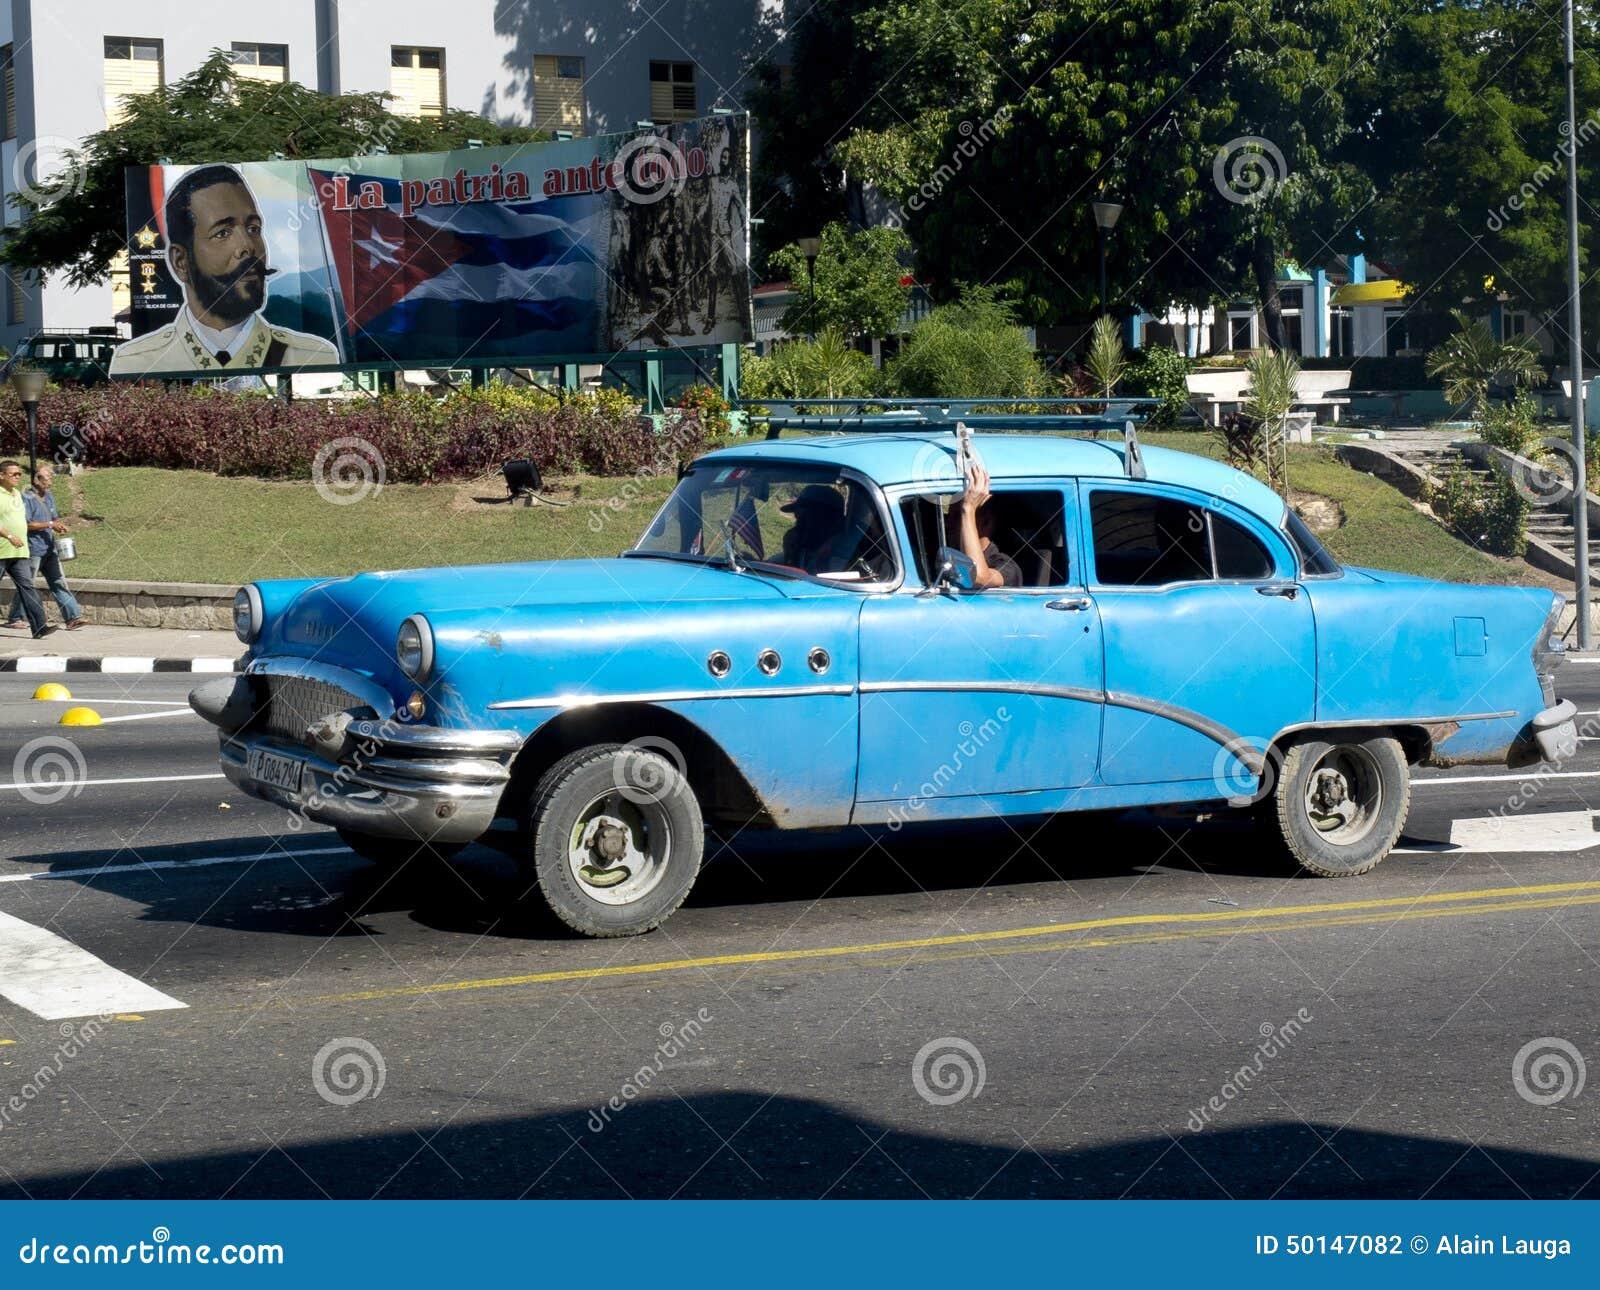 Cuba cuba november 29 an american vintage blue car in the center